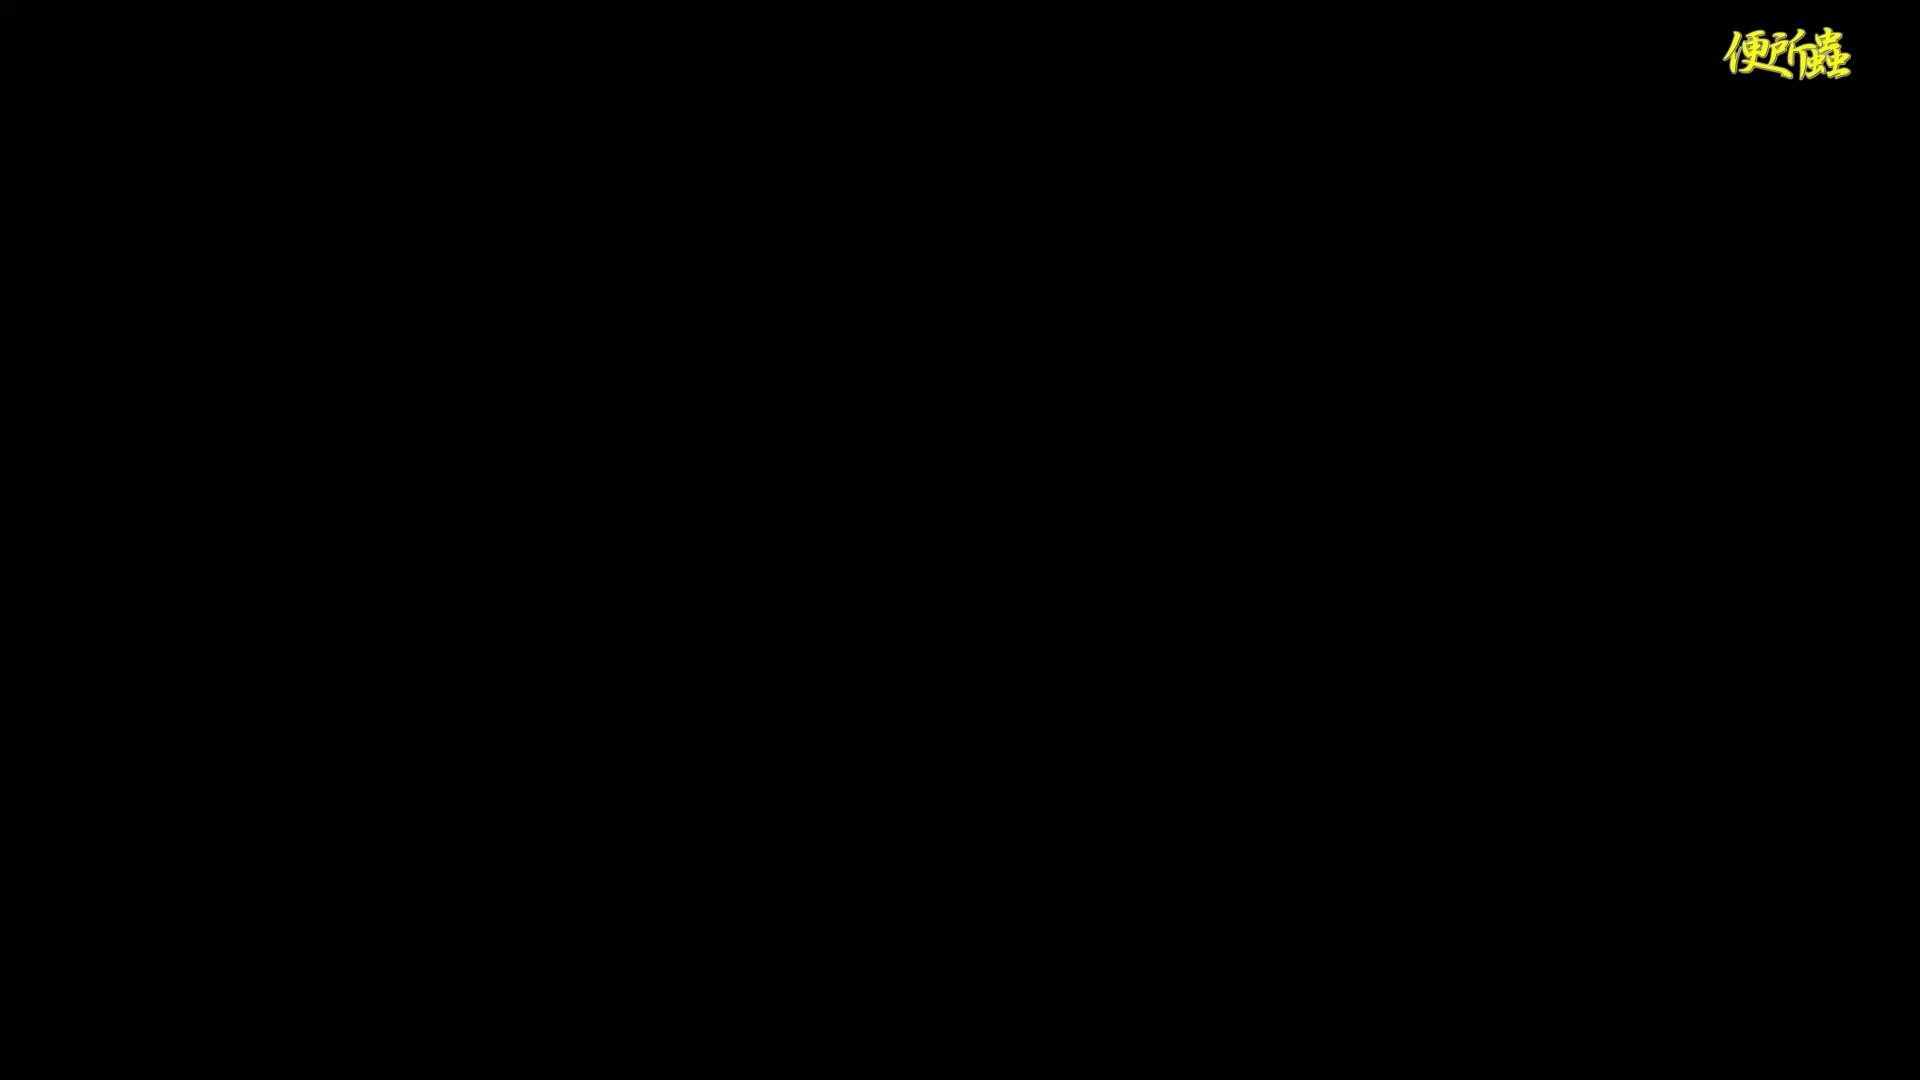 vol.07 便所蟲さんのリターン~寺子屋洗面所盗撮~※画質改善※総勢7名 盗撮  56PIX 5